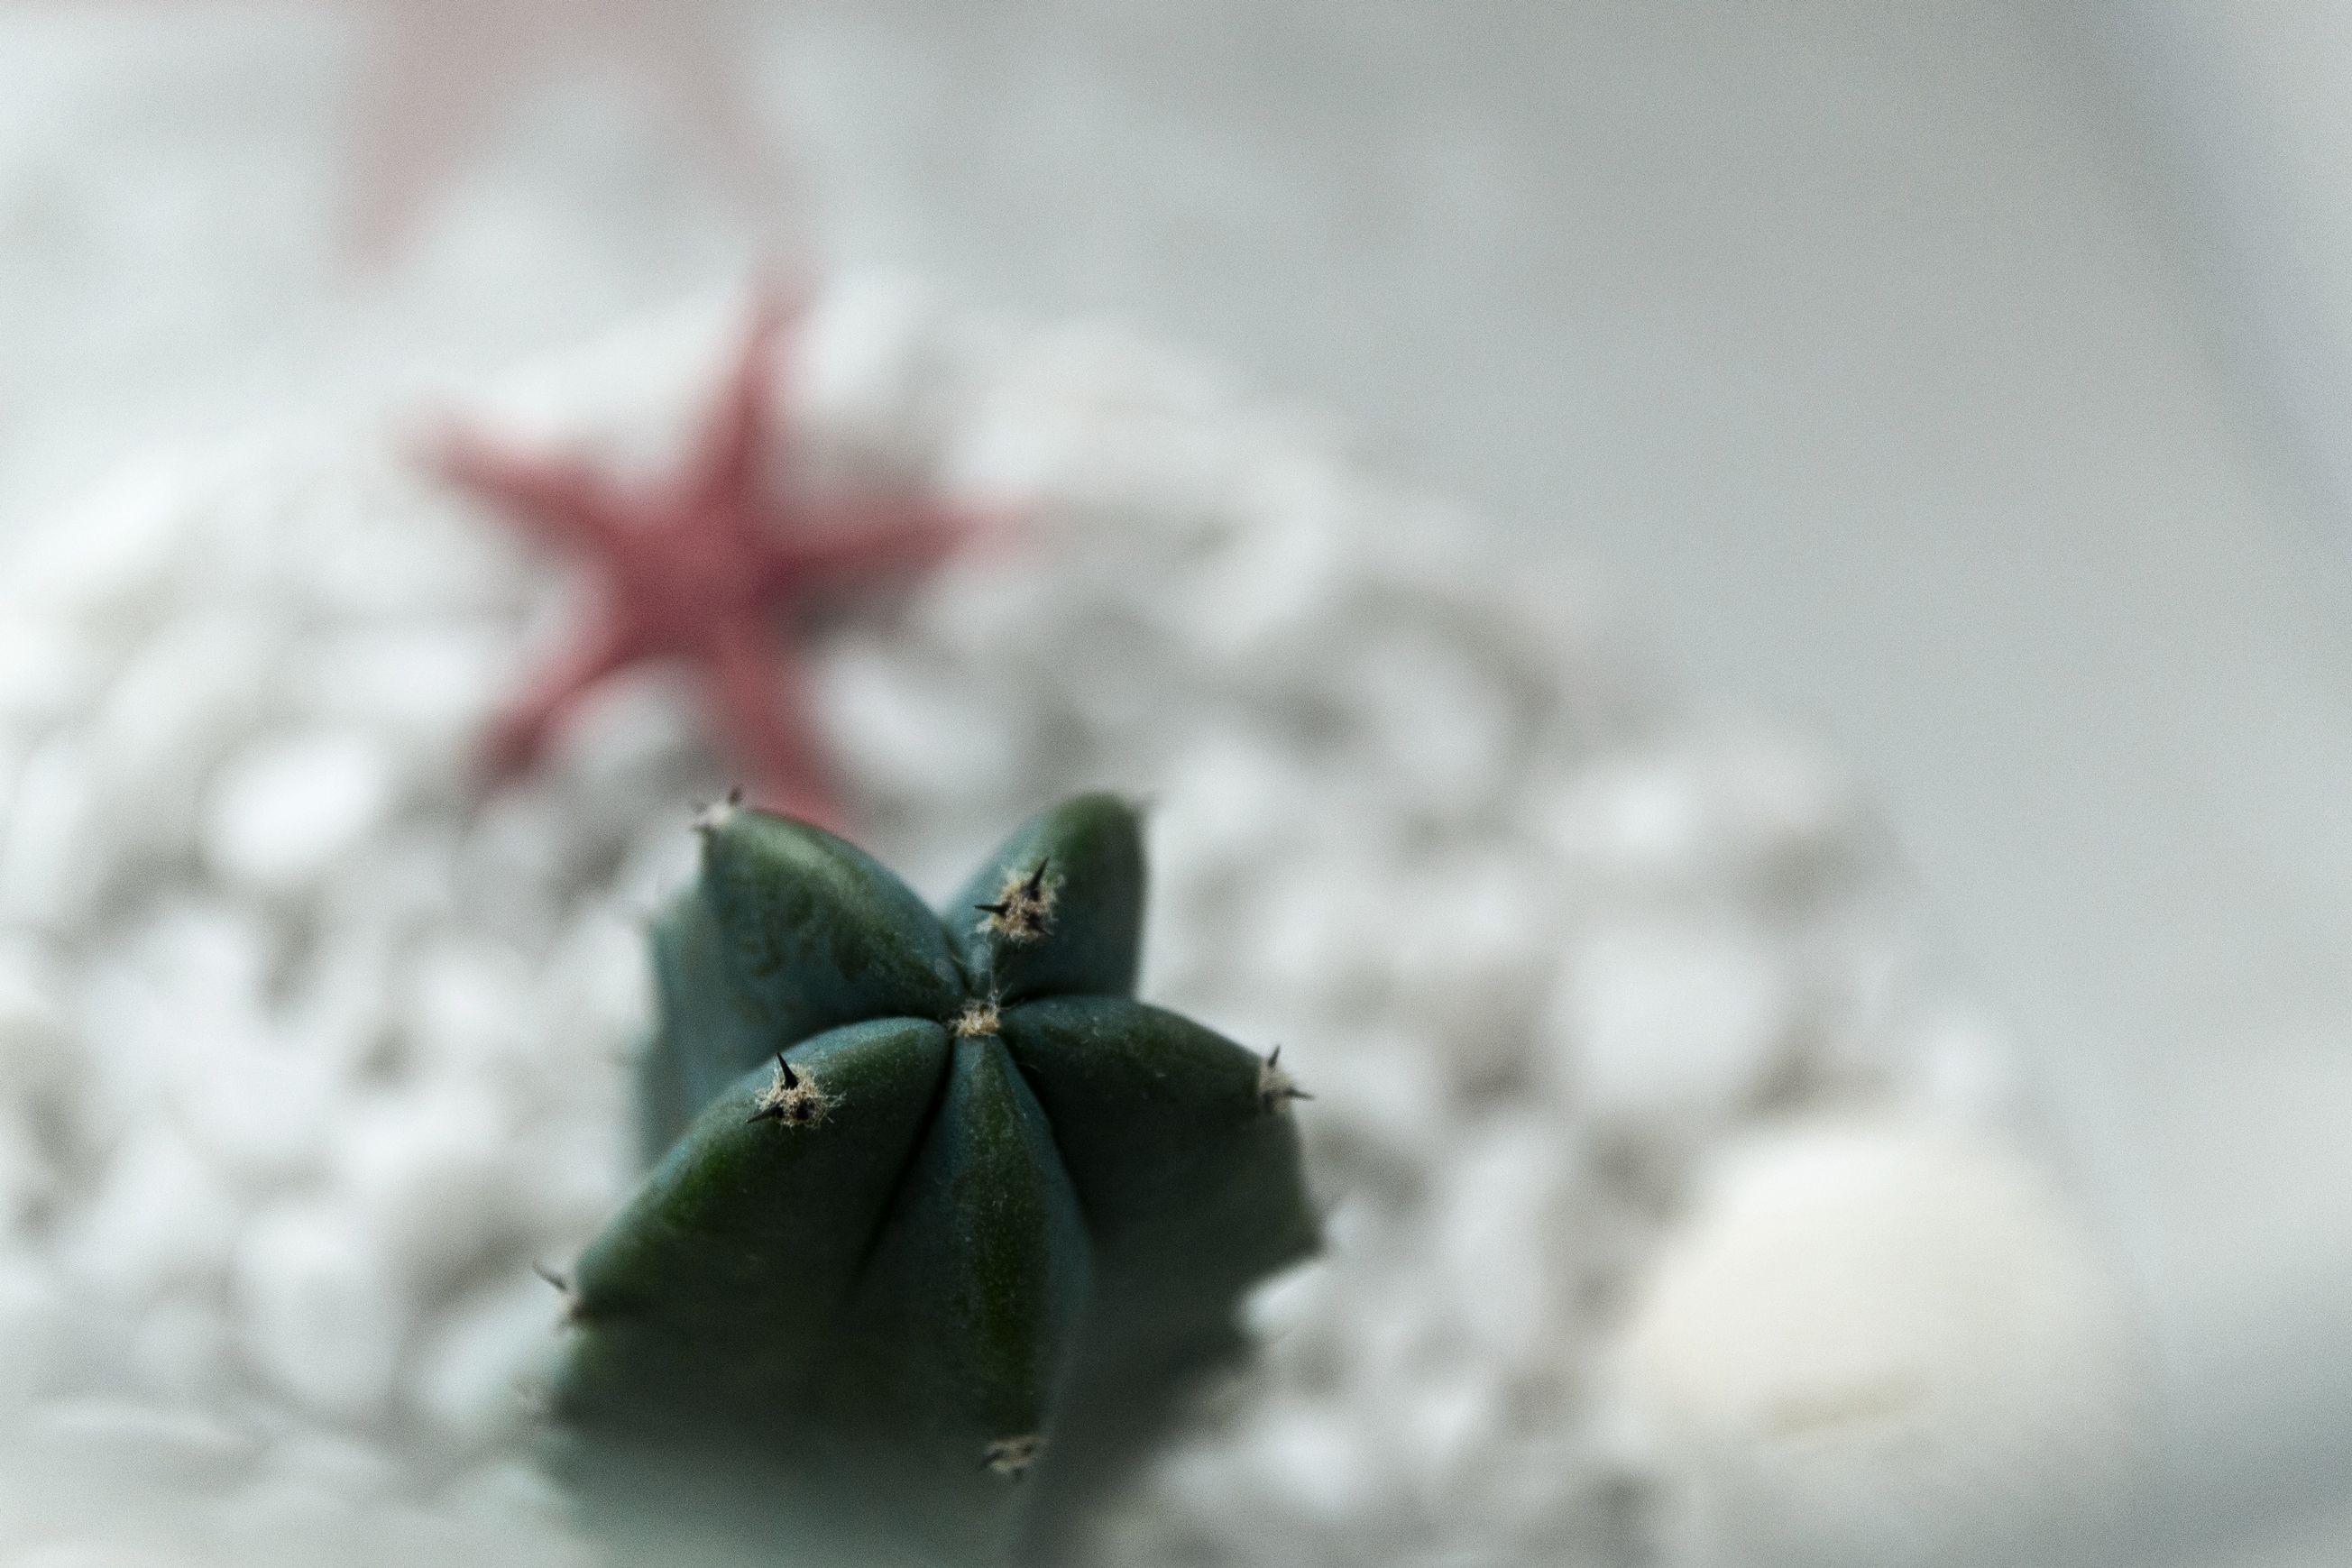 суккулент кактус подарок цветок минисад флорариум кактусы цветы суккуленты